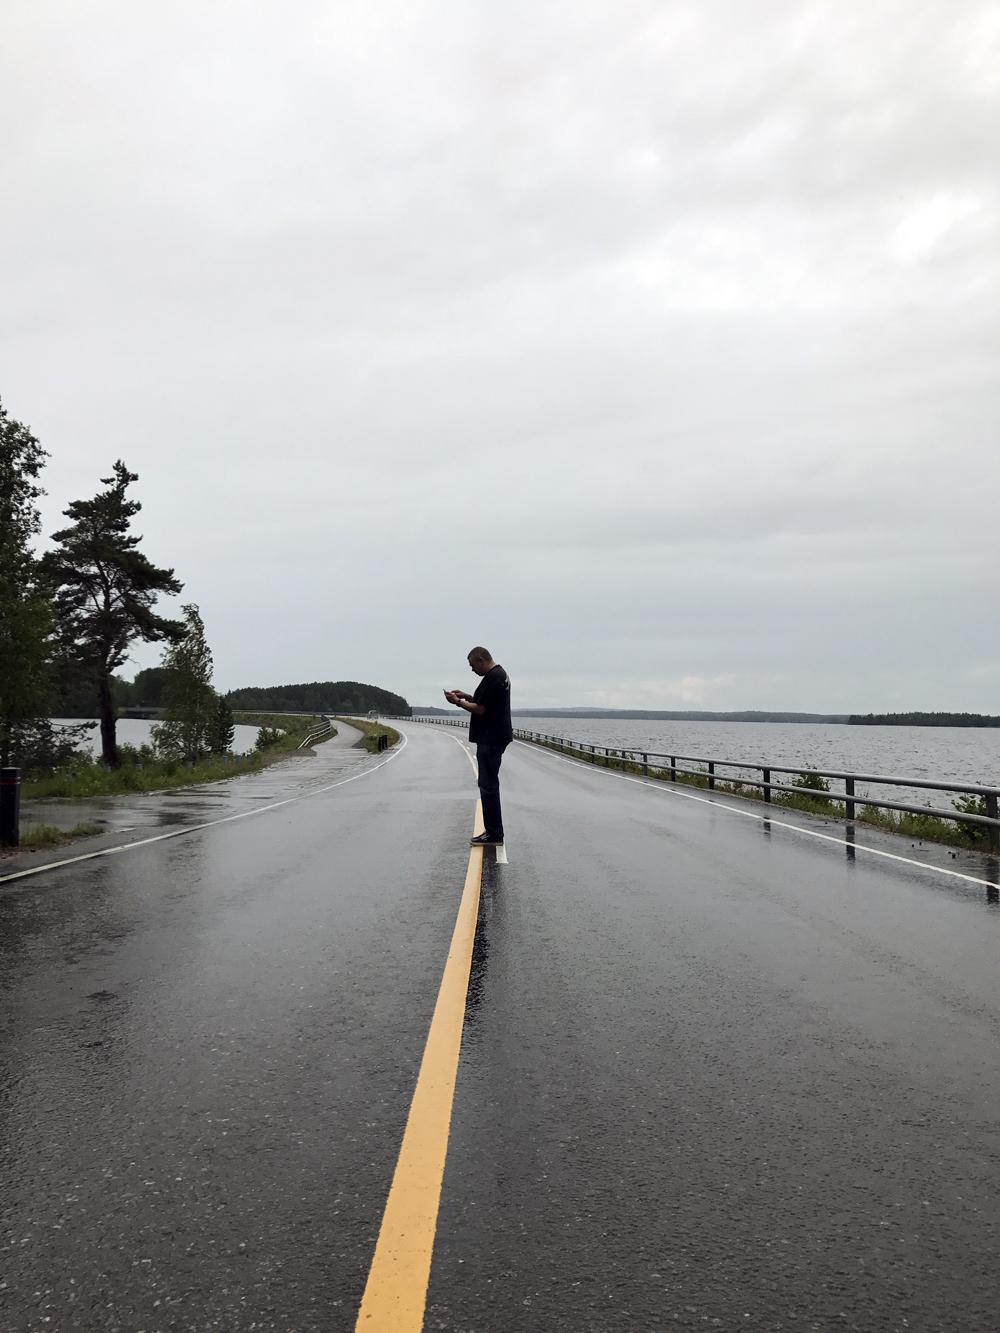 Keski-Suomen roadtrip 1